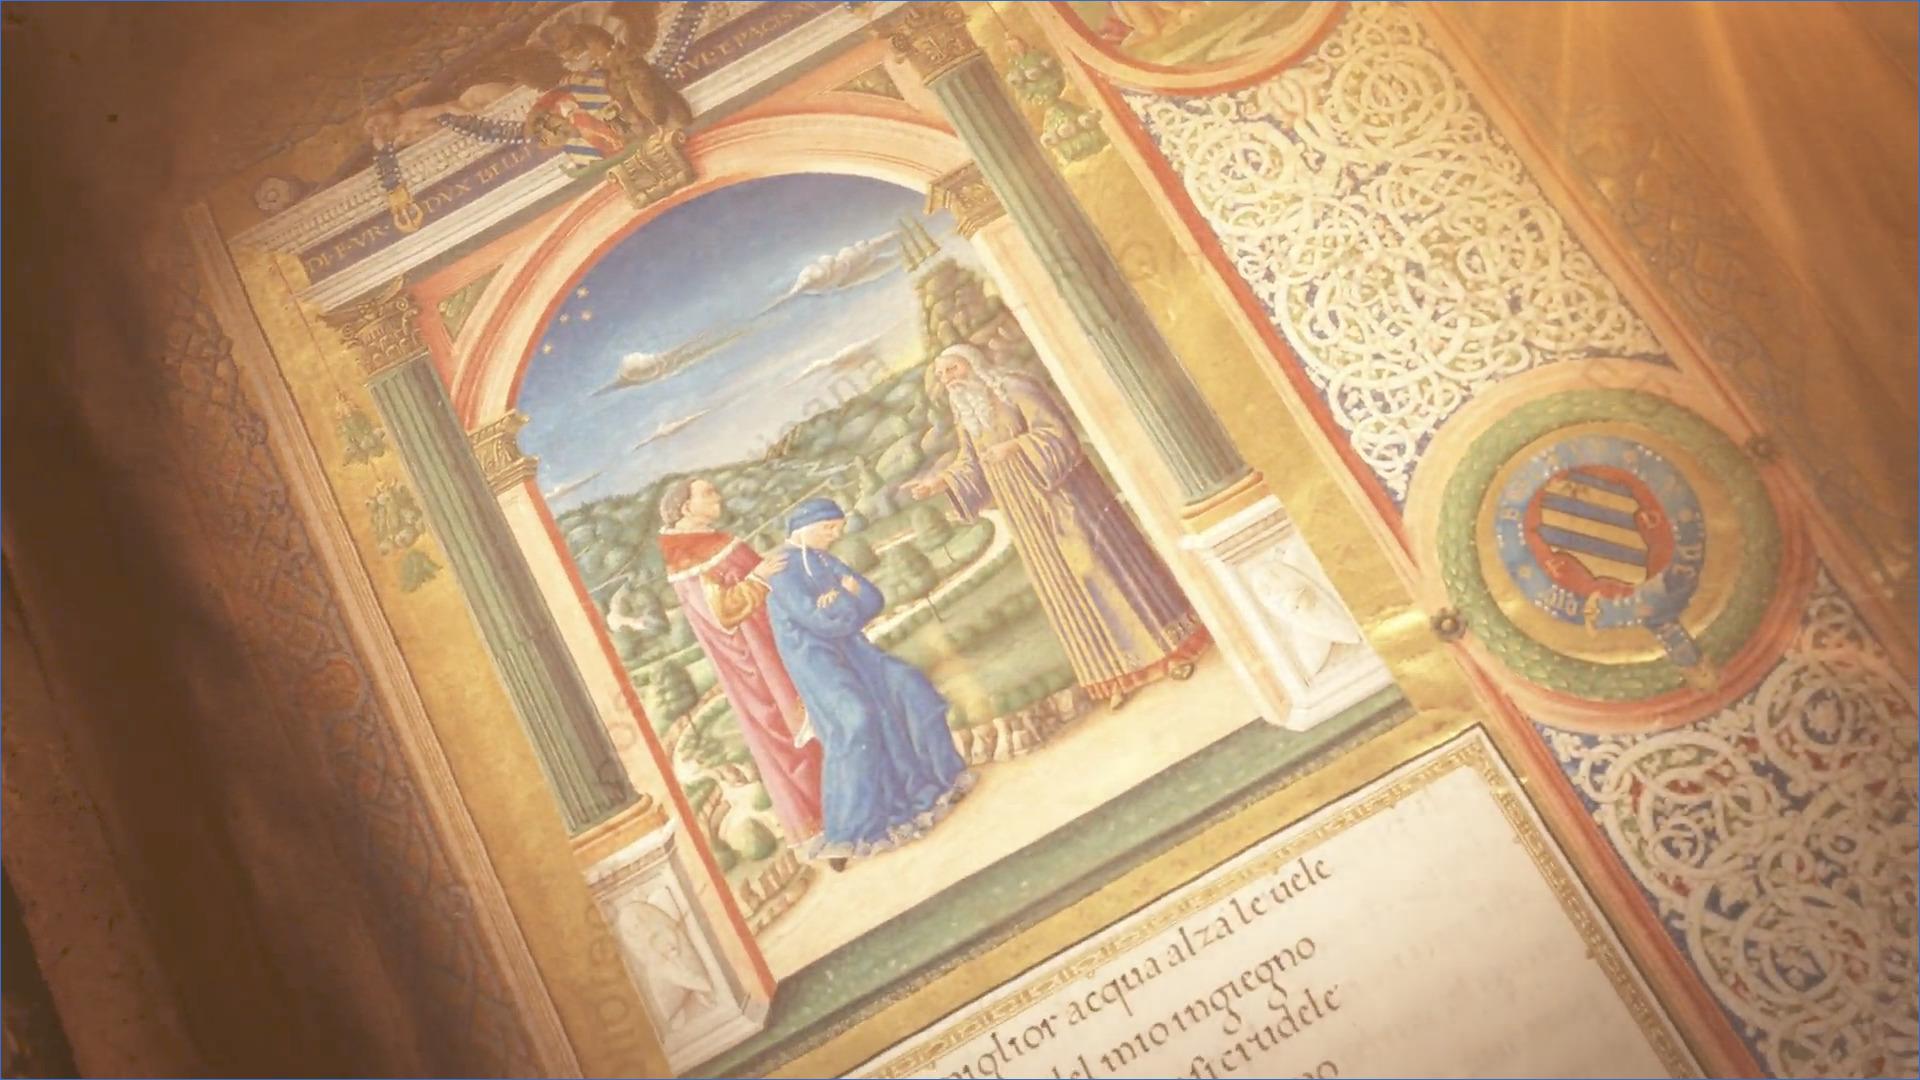 Dante Alighieri, capture @ vaticanlibrary.va